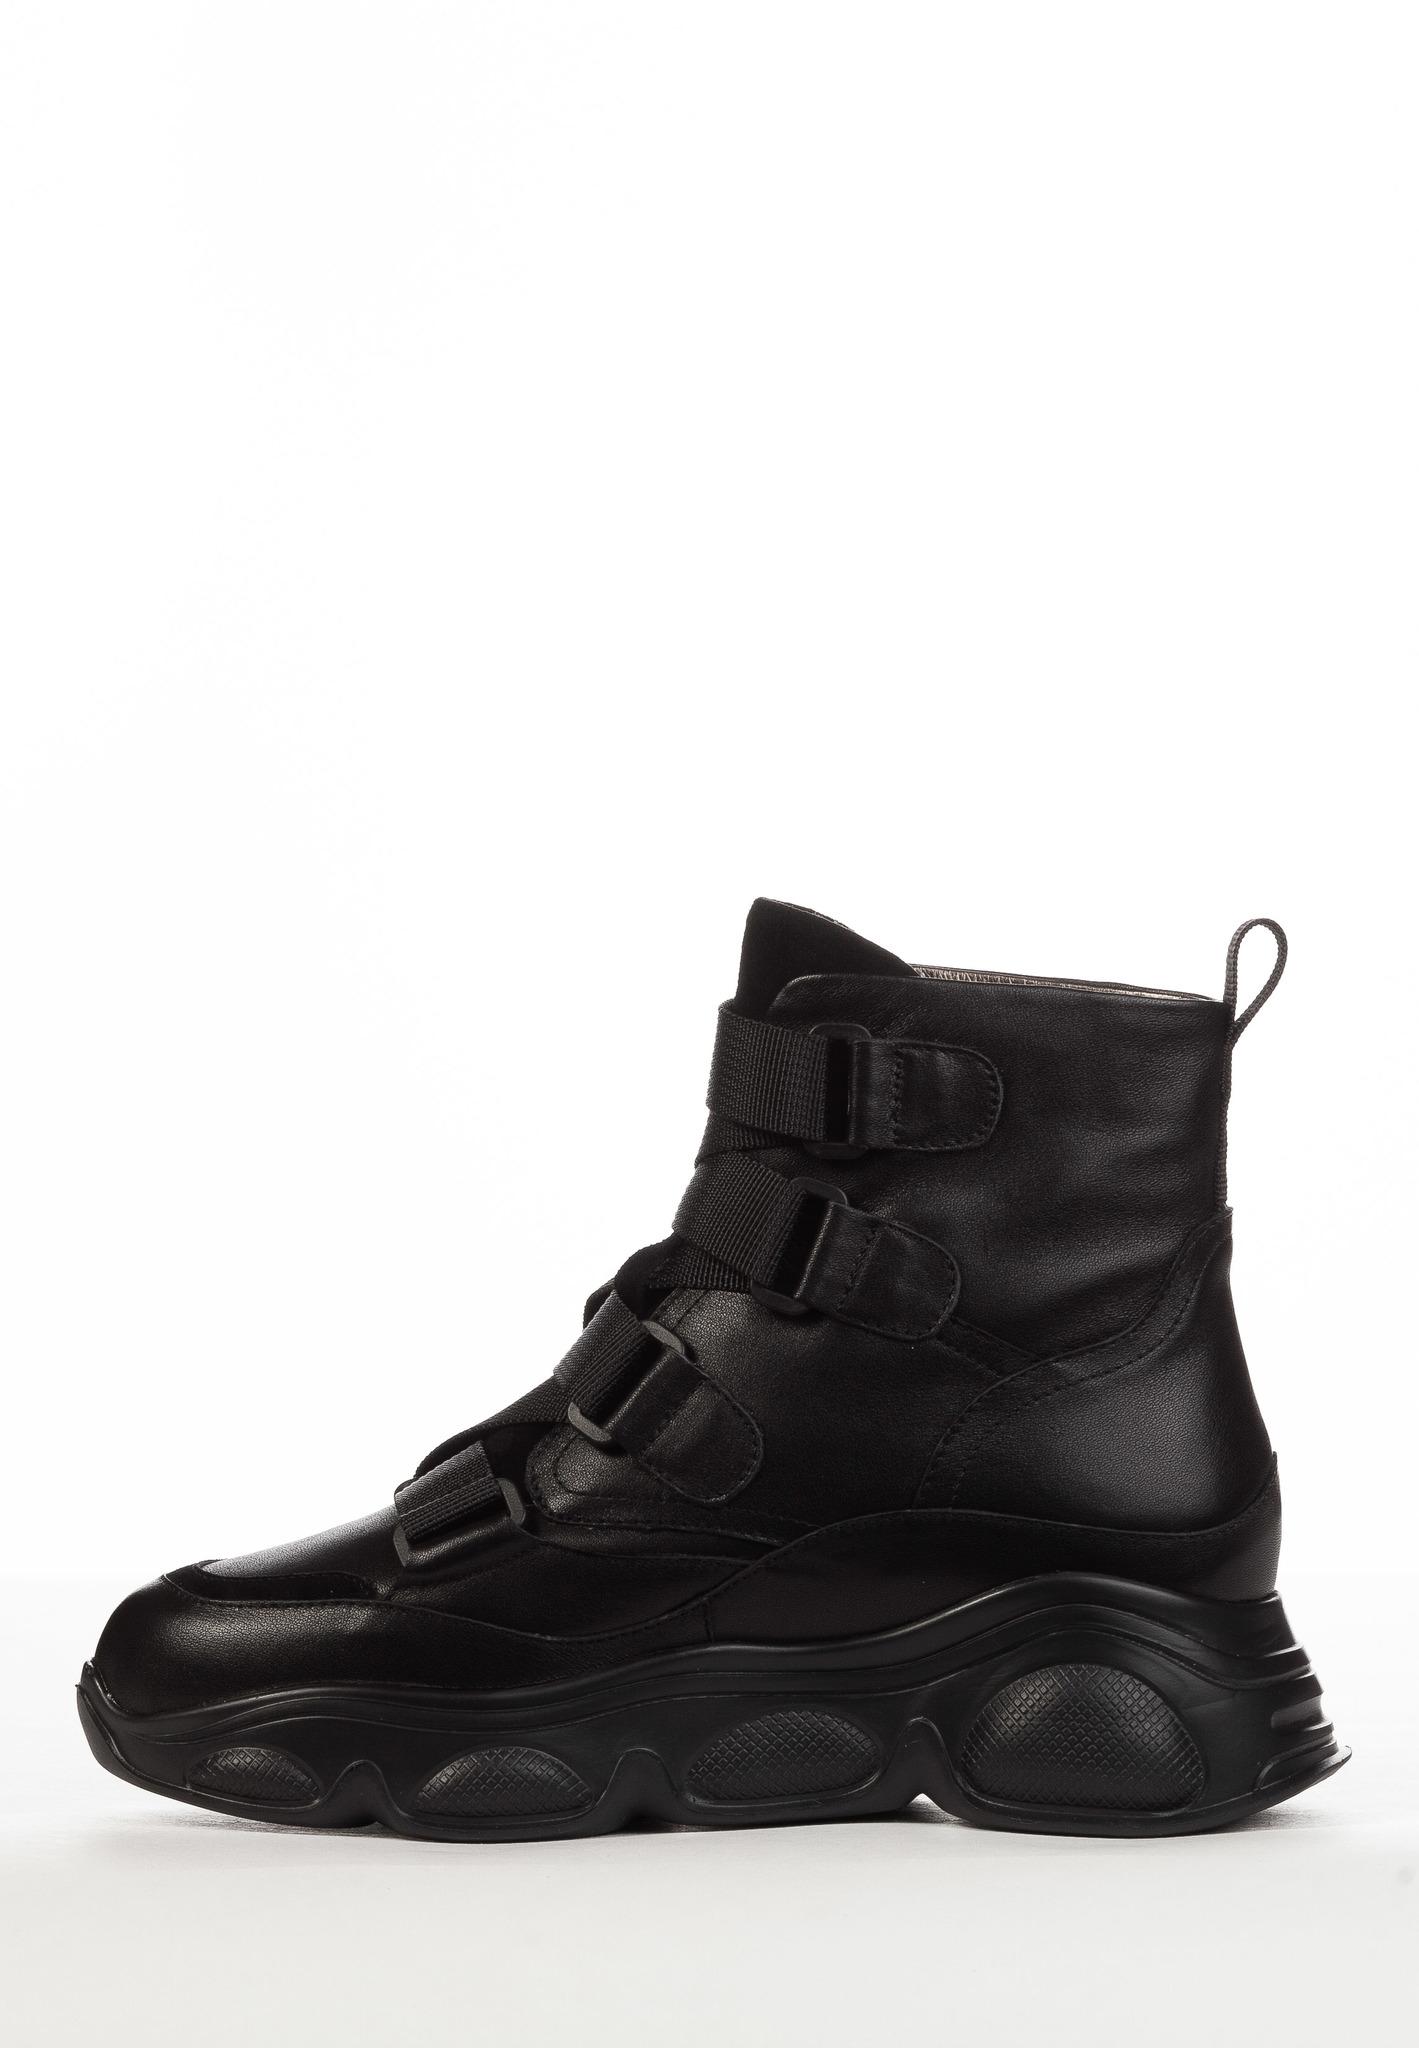 Ботинки, Обувь Нижний Новгород, Купить Ботинки